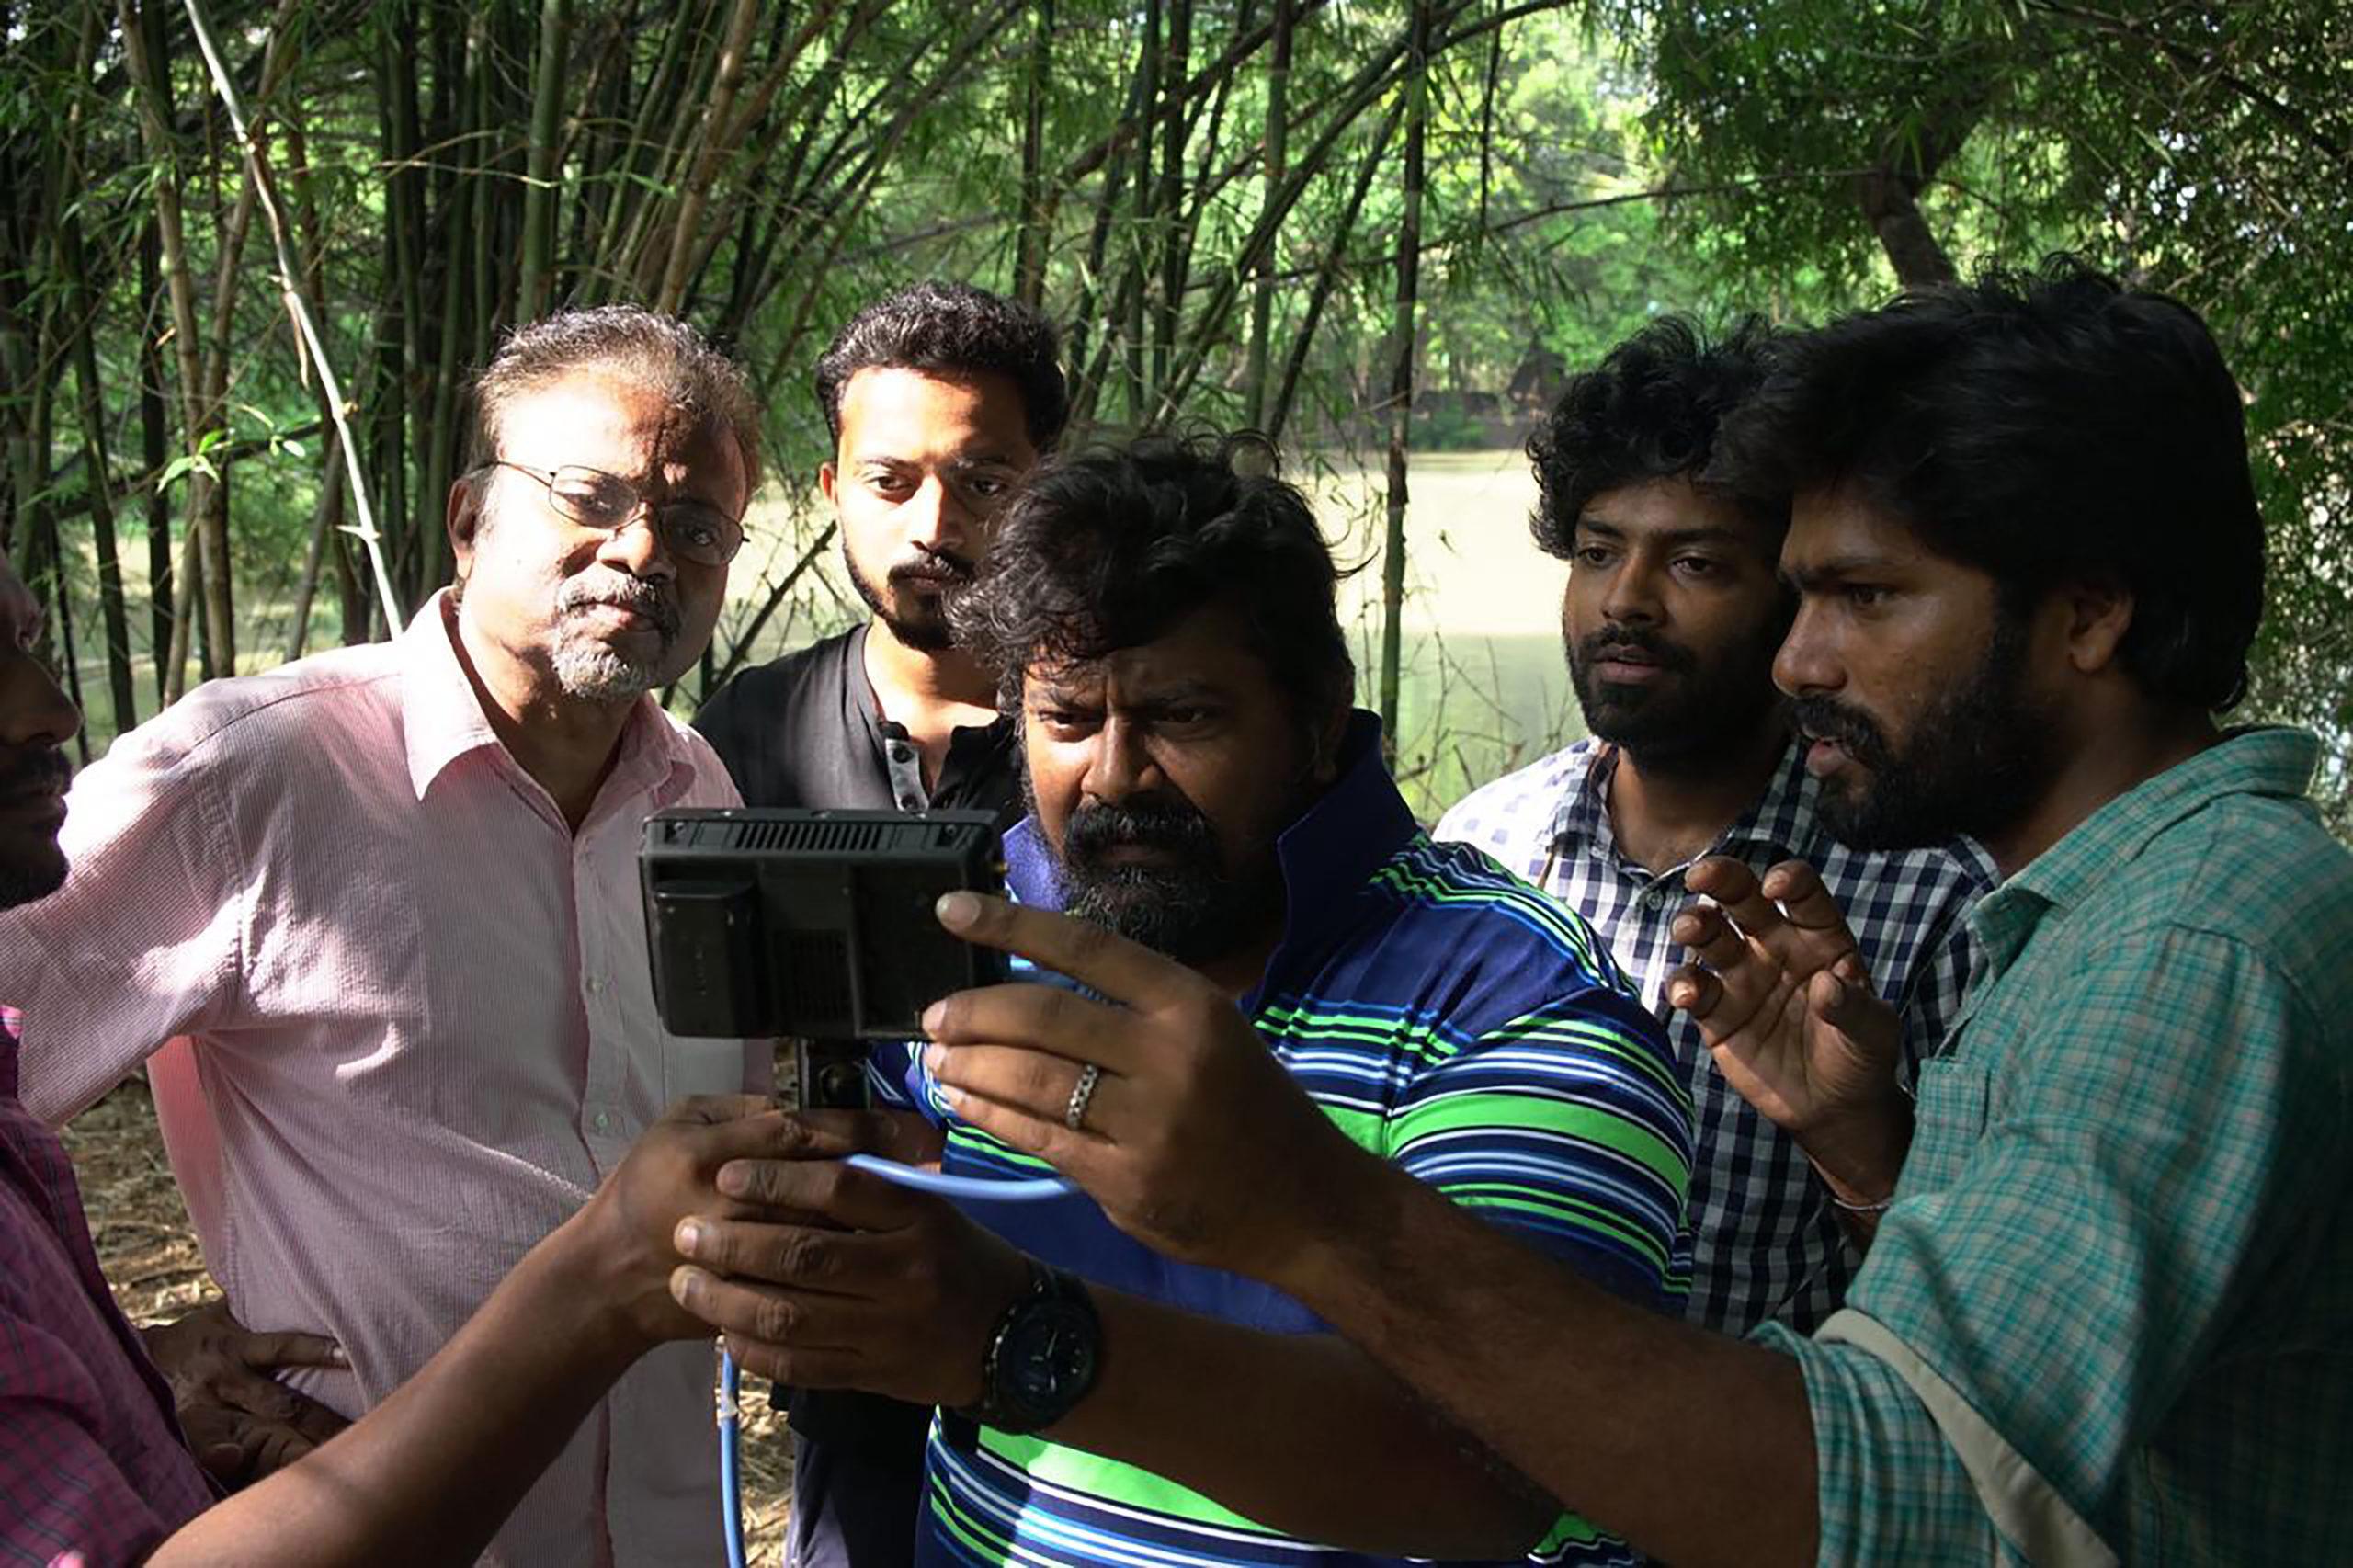 Dr. Swarnavel Eswaran Pillai: Seeing Life and Culture Through Film